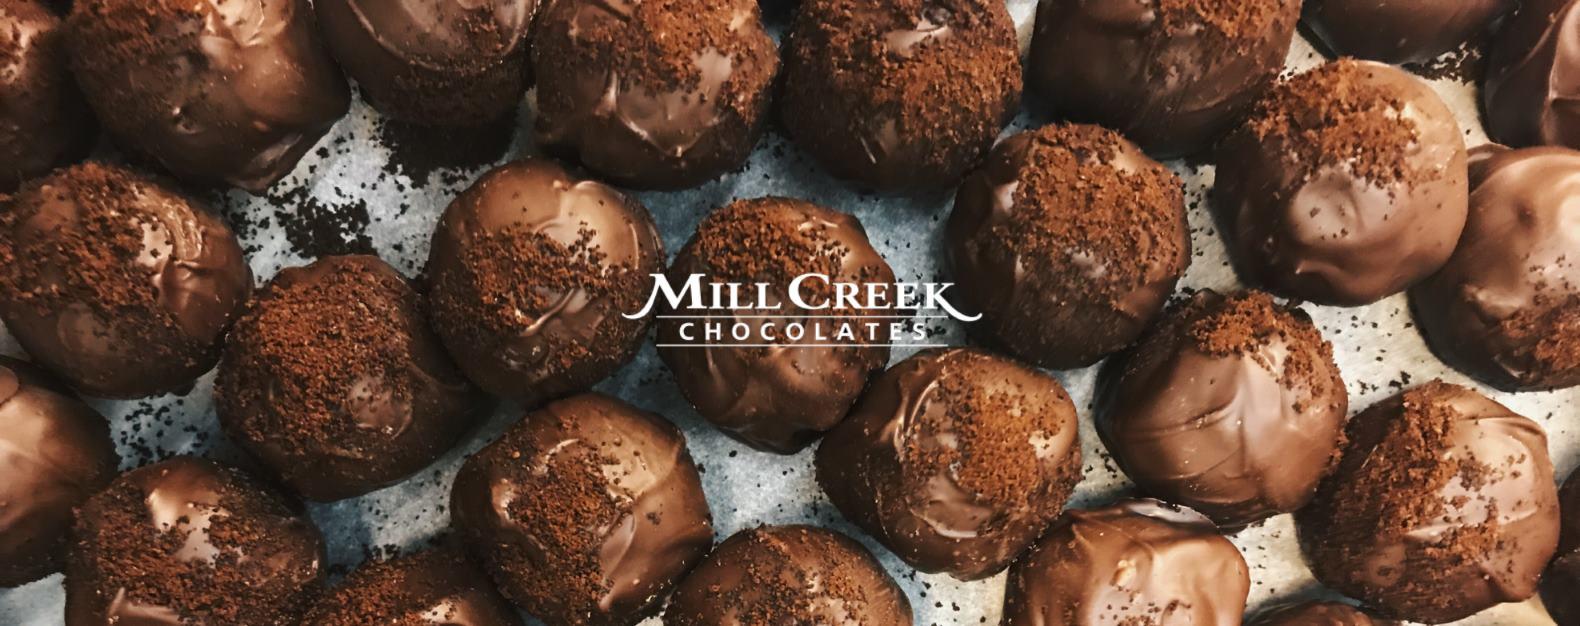 Chocolates and Mill Creek Chocolates logo